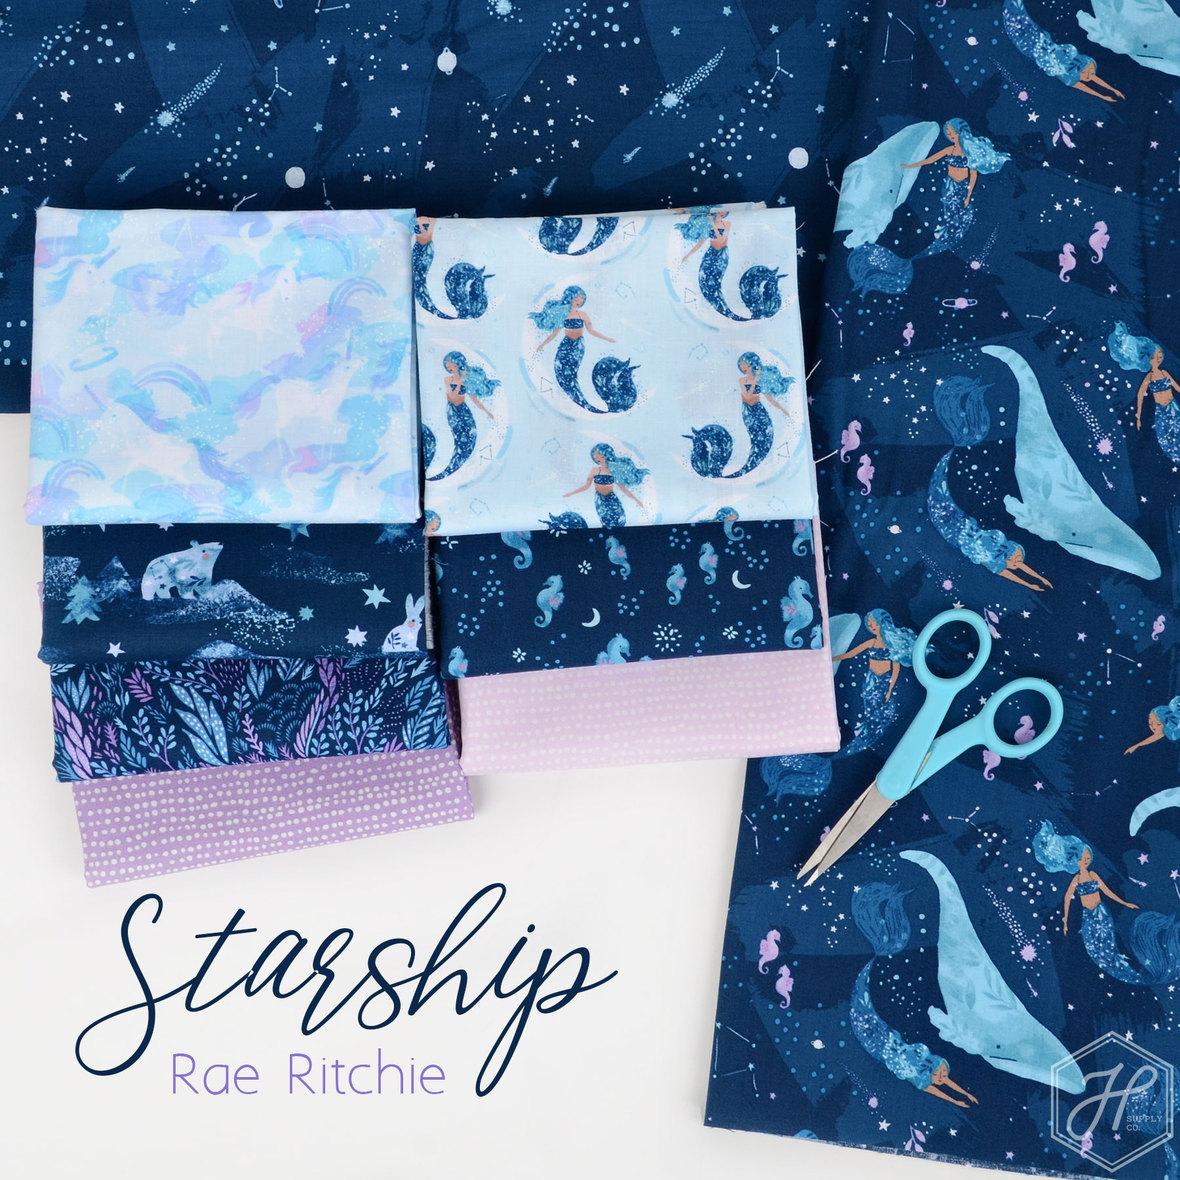 Starship-Fabric-Dear-Stella-at-Hawthorne-Supply-Co.